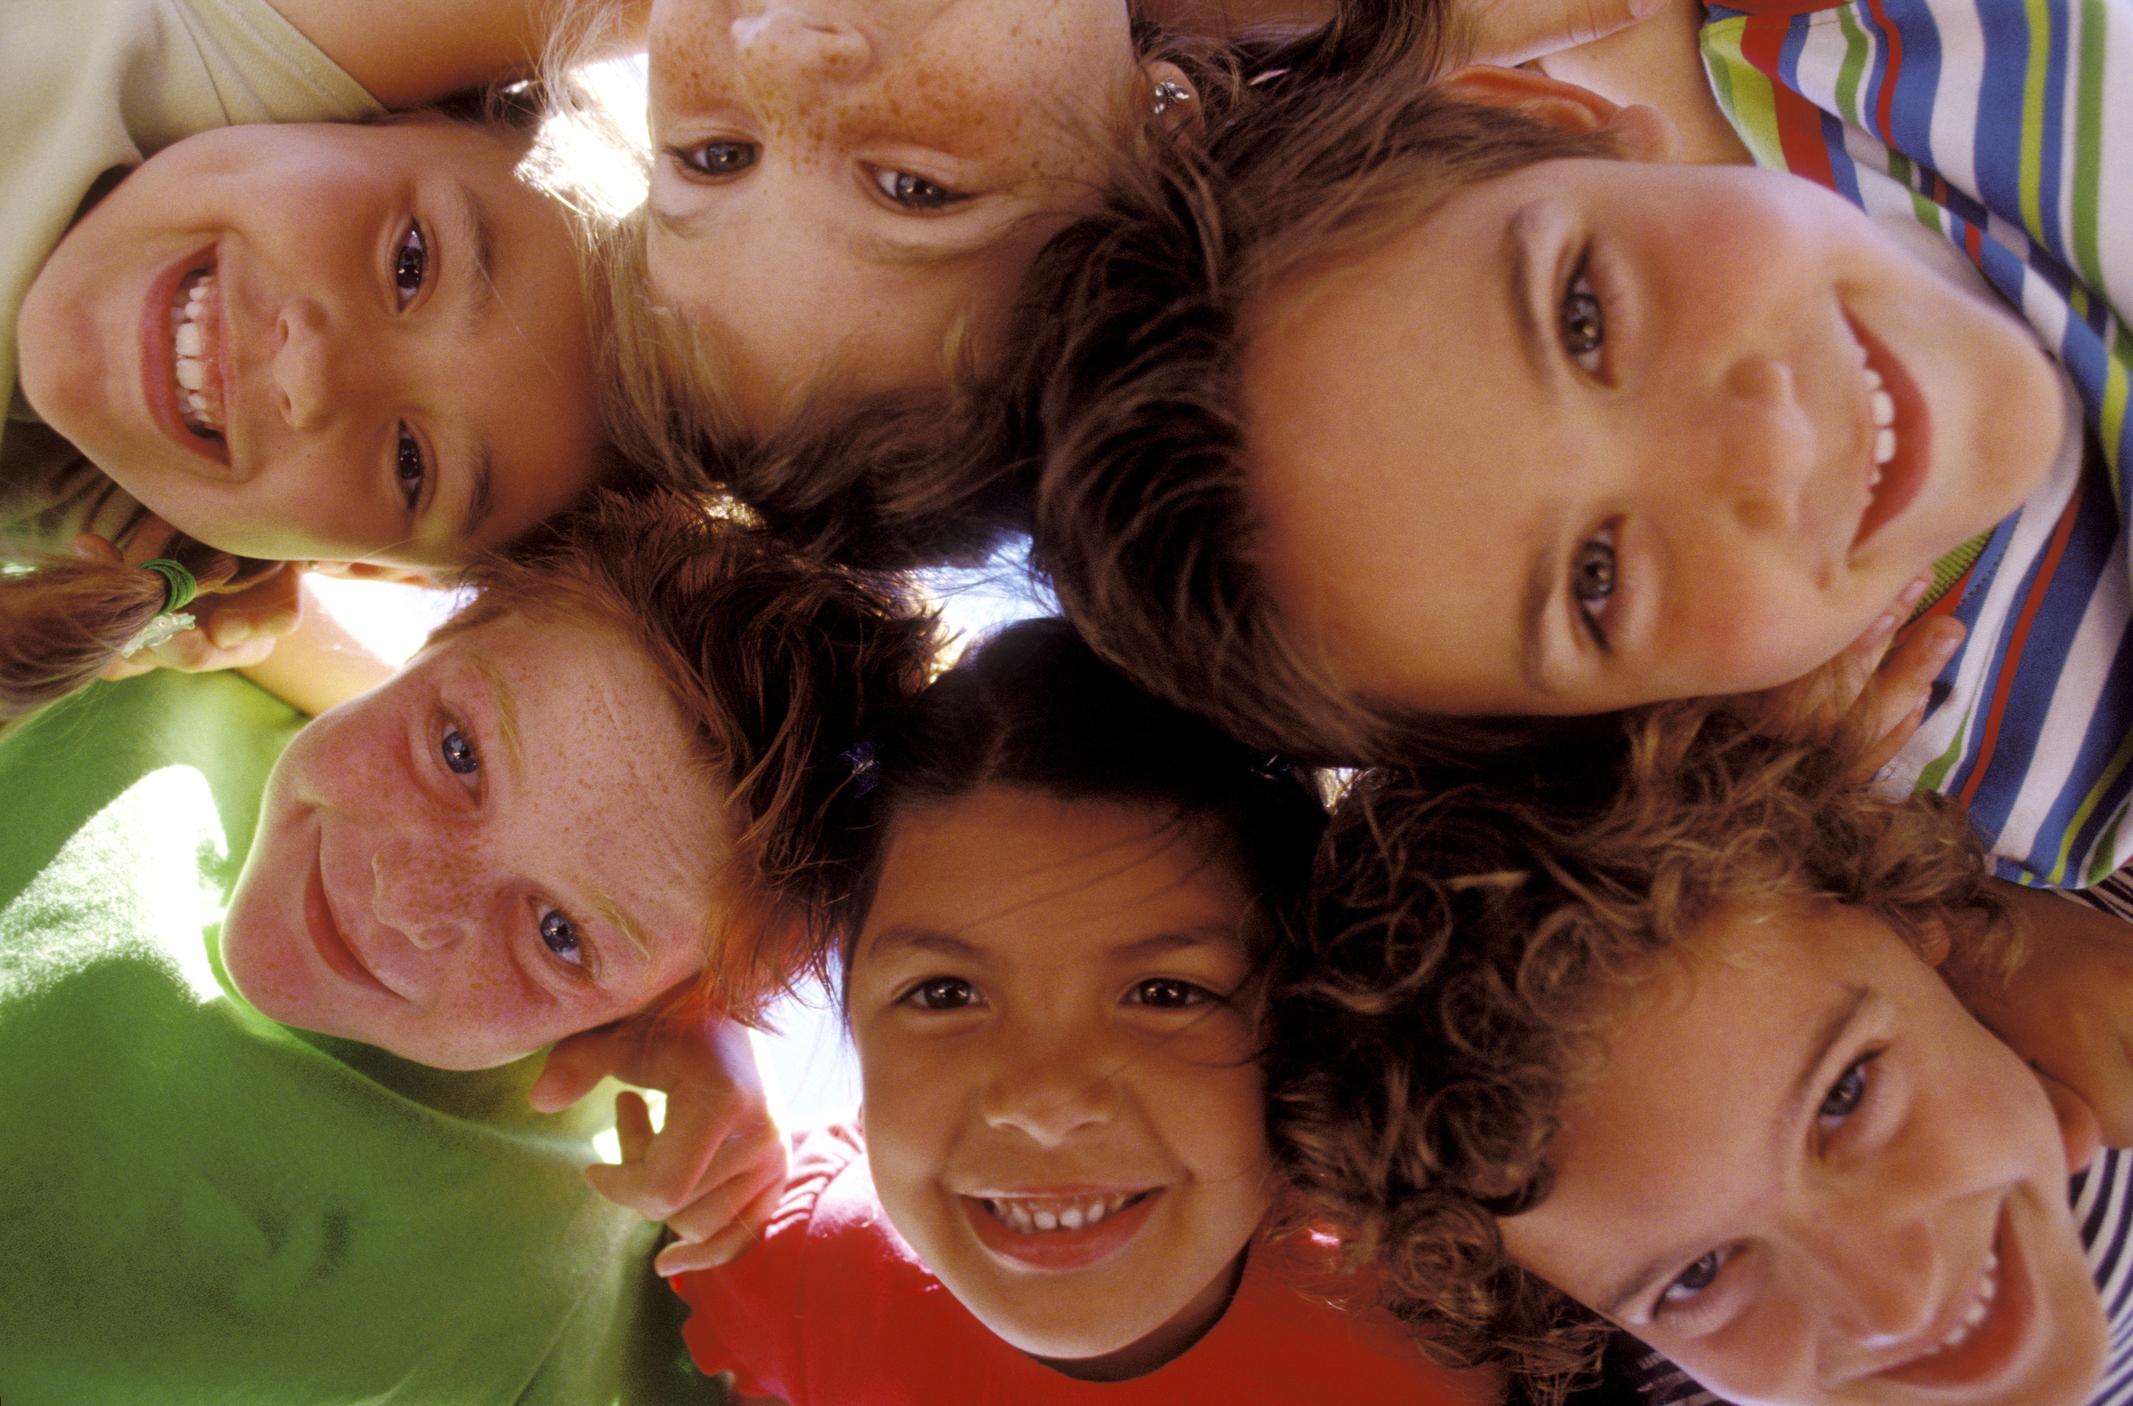 naturopath victoria, naturopathic medicine victoria, naturopathic doctor victoria, naturopathic pediatrics, naturopath children's health, healthy kids, ADHD